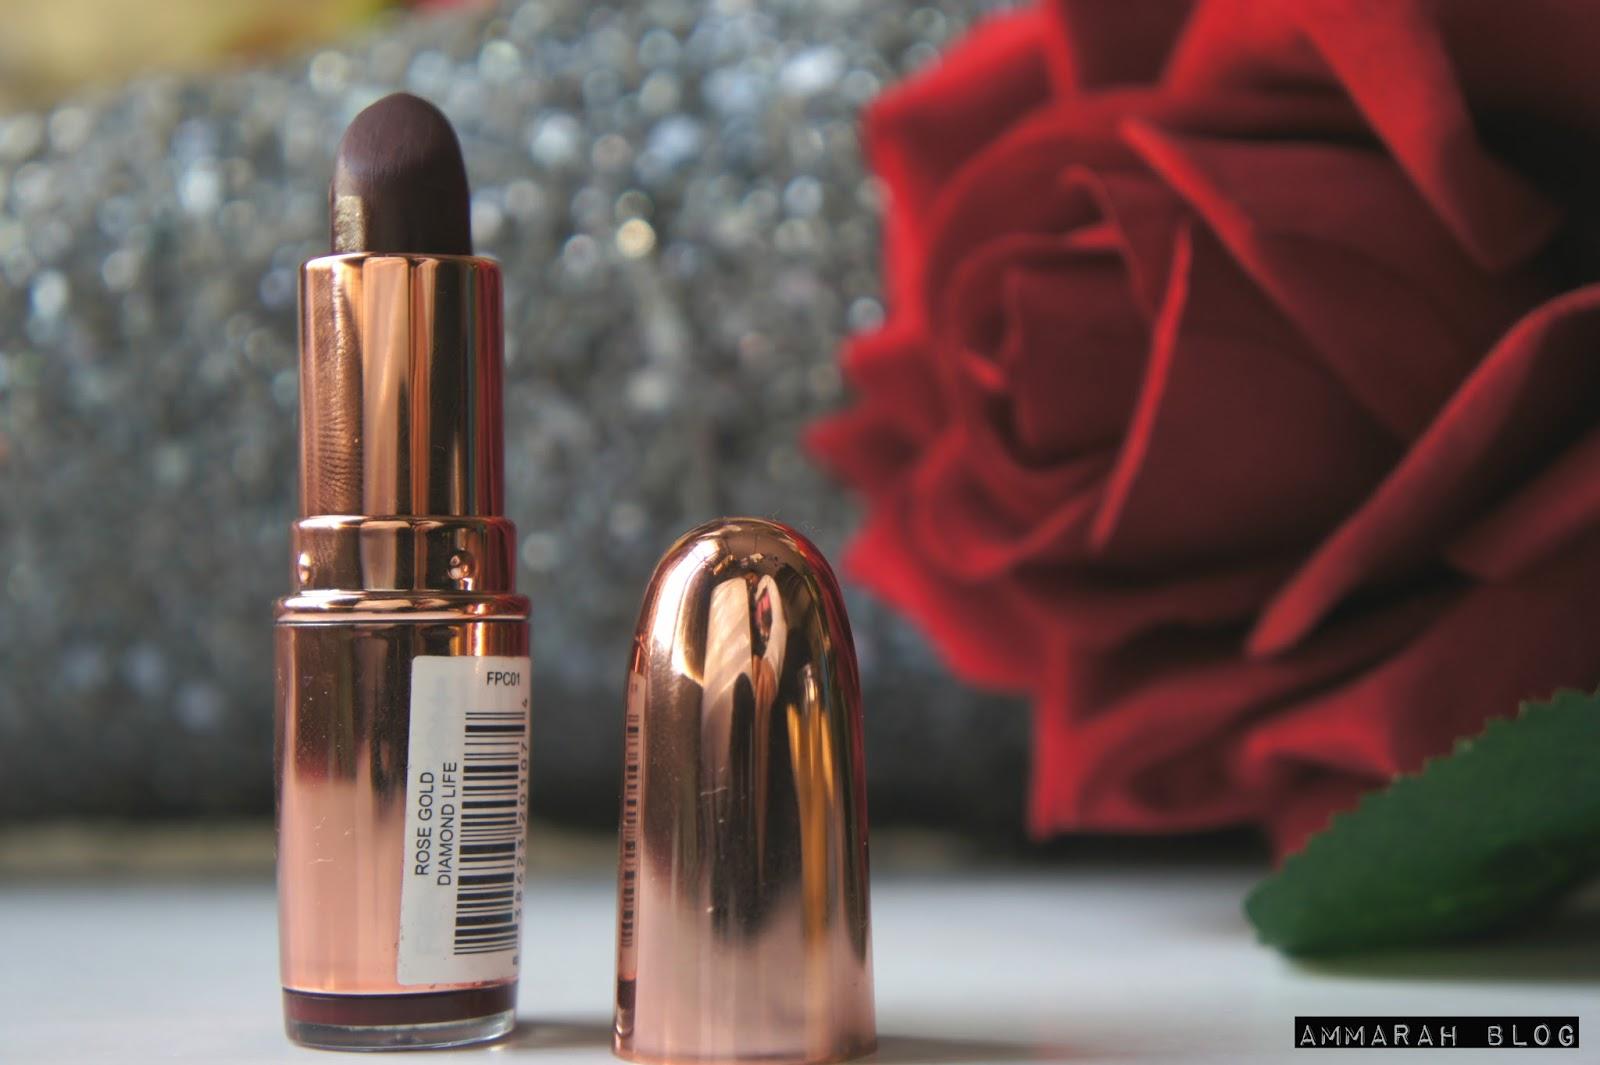 Ammarah Blog: Makeup Revolution Rose Gold Lipstick - Diamond Life